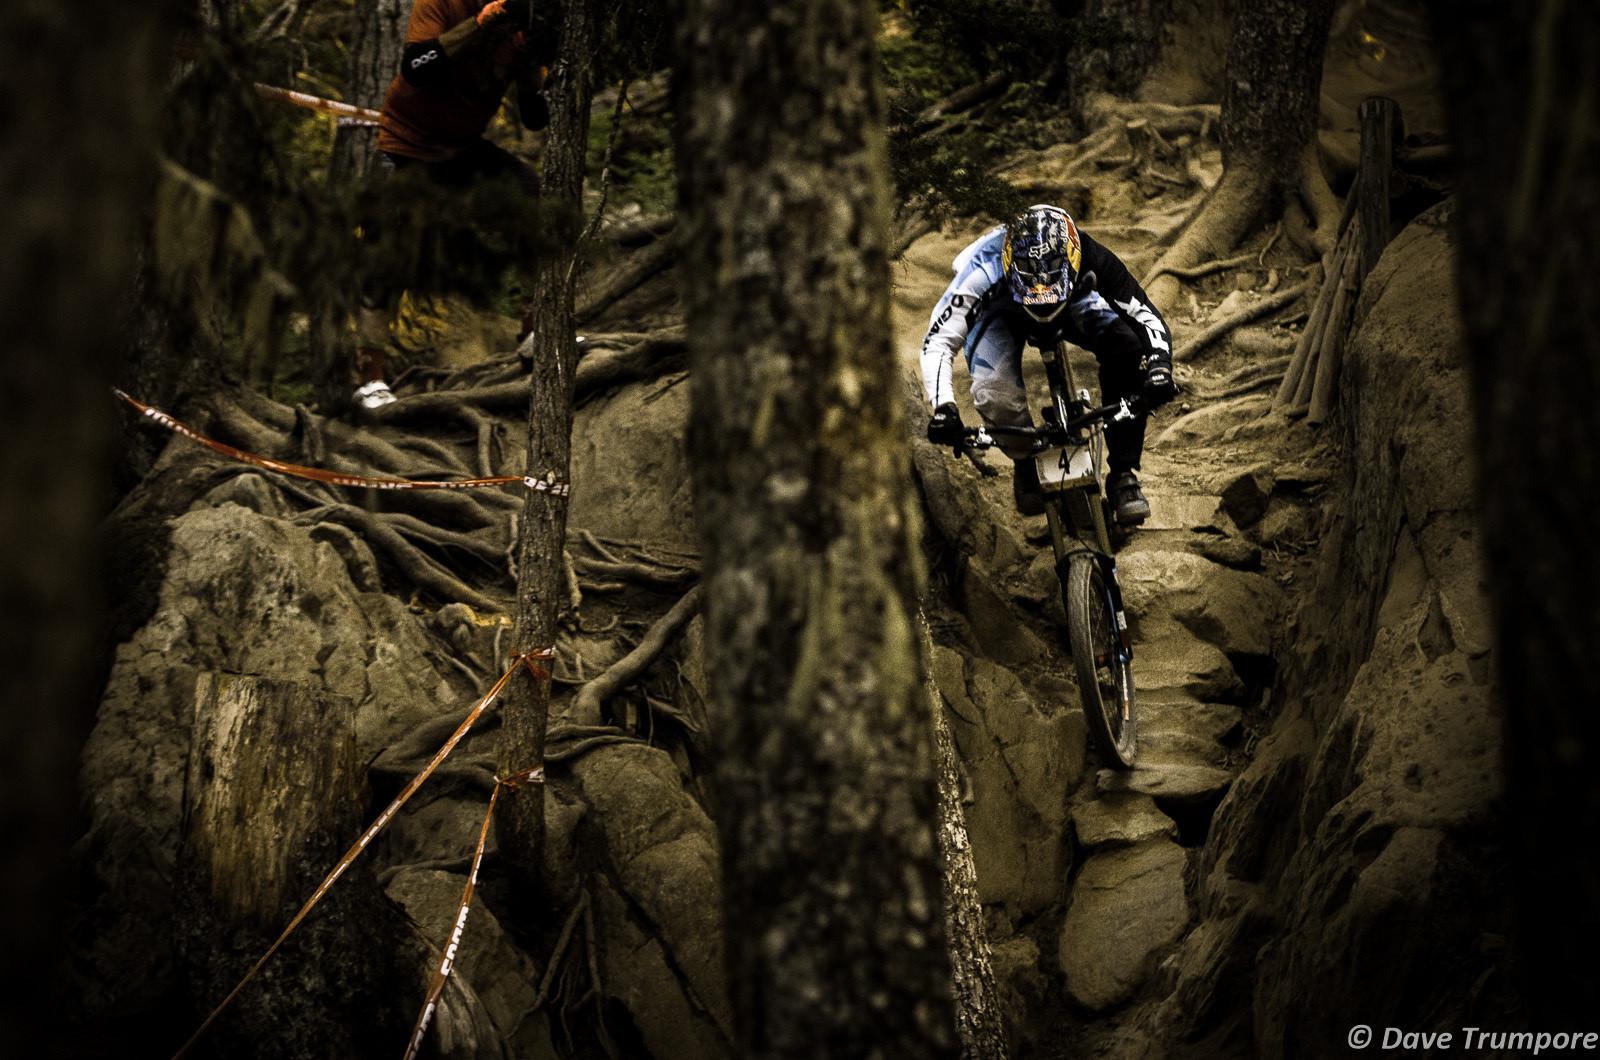 Whistler DH Action: Marcelo Gutierrez Wins Crankworx Garbanzo DH - Crankworx Whistler Garbanzo DH - Mountain Biking Pictures - Vital MTB